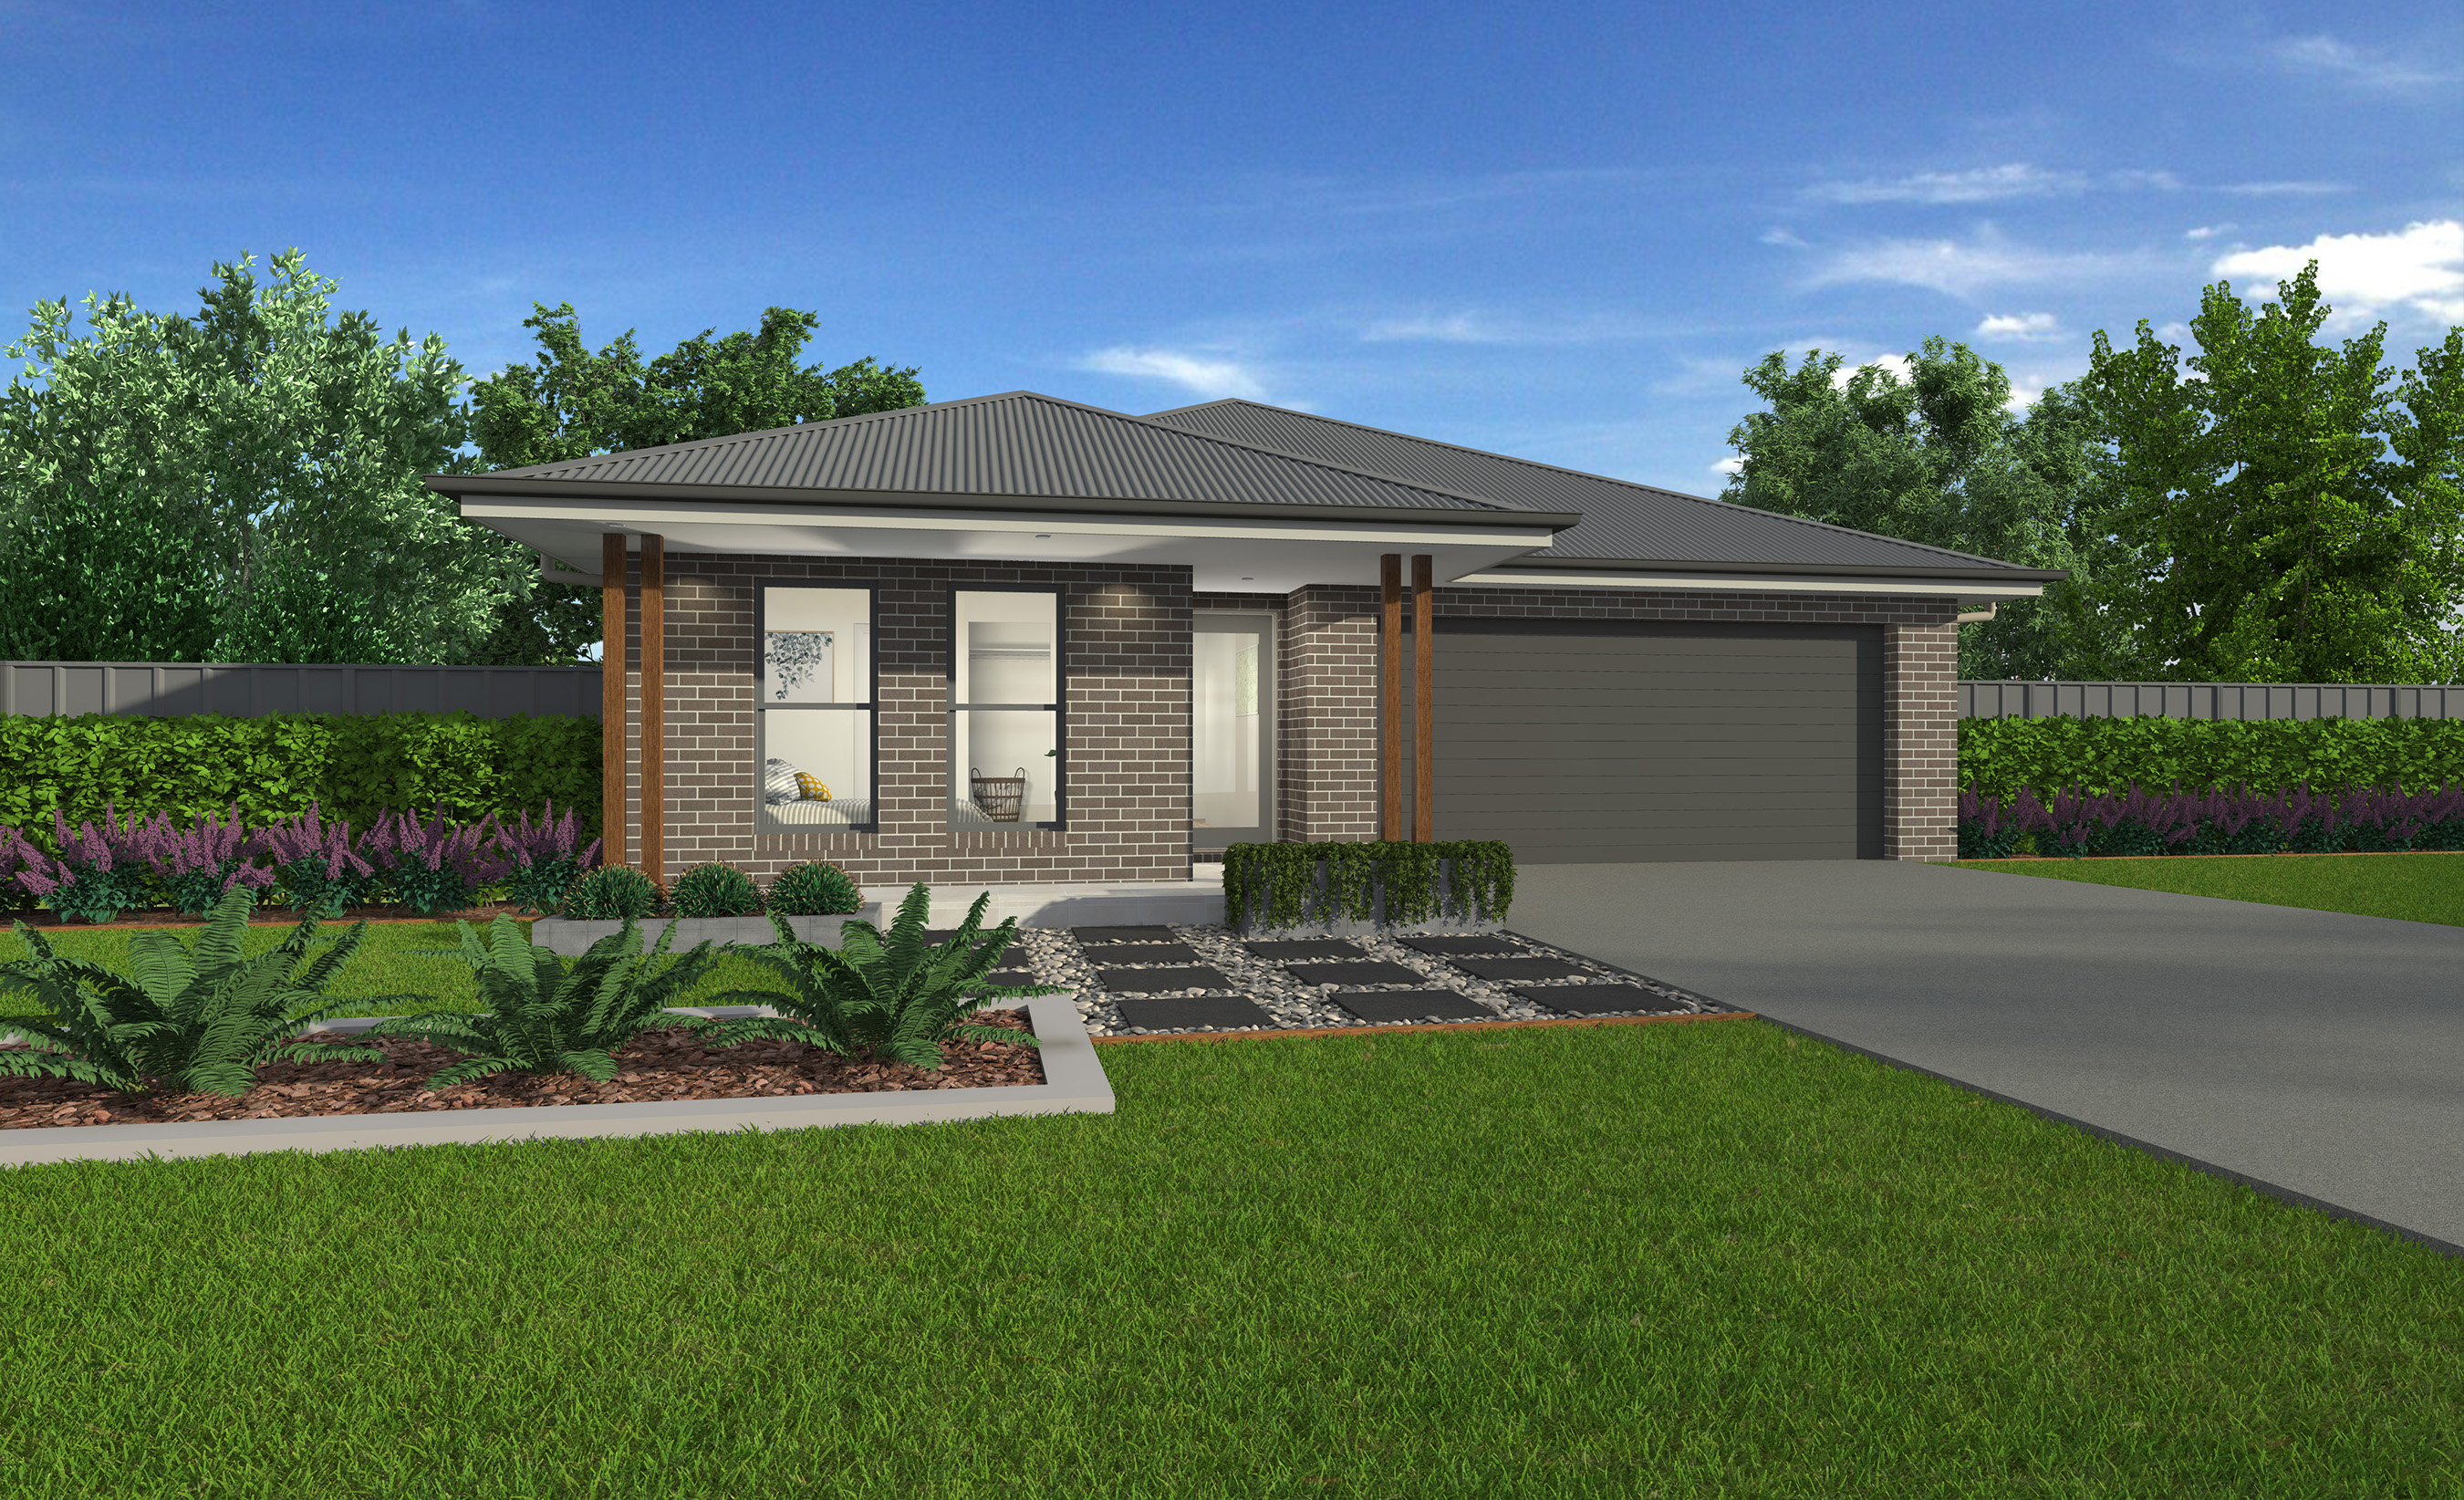 2015896969 1 pi 191120 043958 w2701 h1644 - 43+ Modern 3 Bedroom House Plans Australia  Pictures